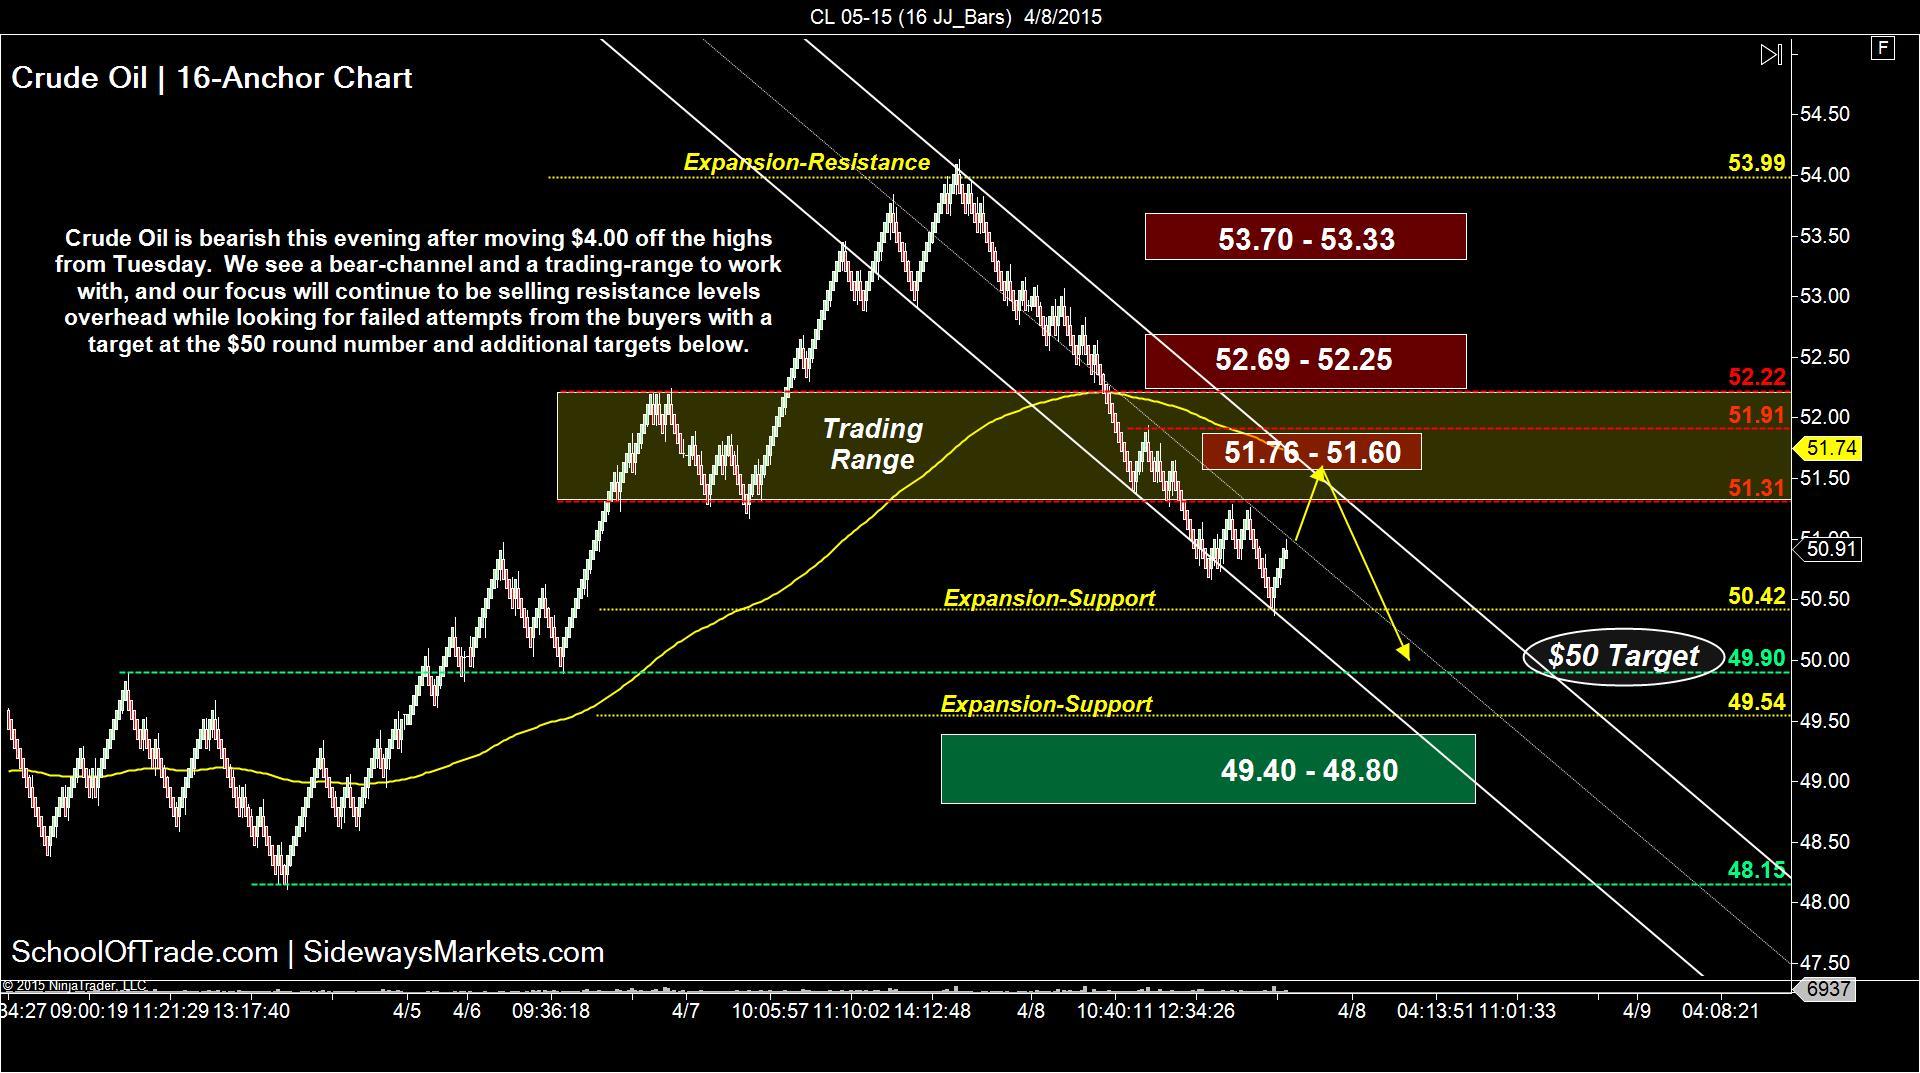 http://charts.stocktwits.com/production/original_35124200.jpg?1428537033